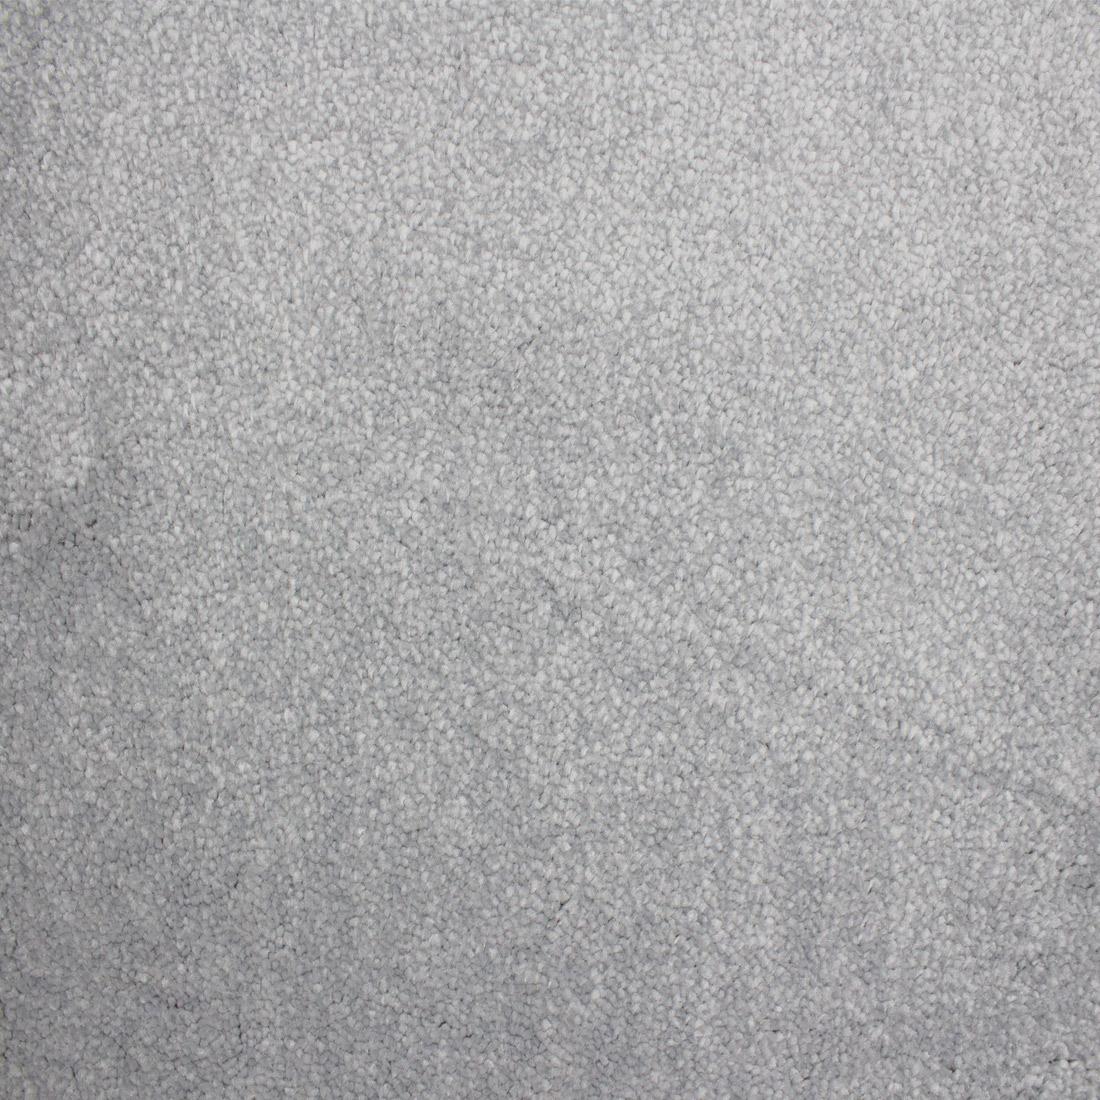 Vloerkleed Xilento Soft Dolphin | 170 x 230 cm